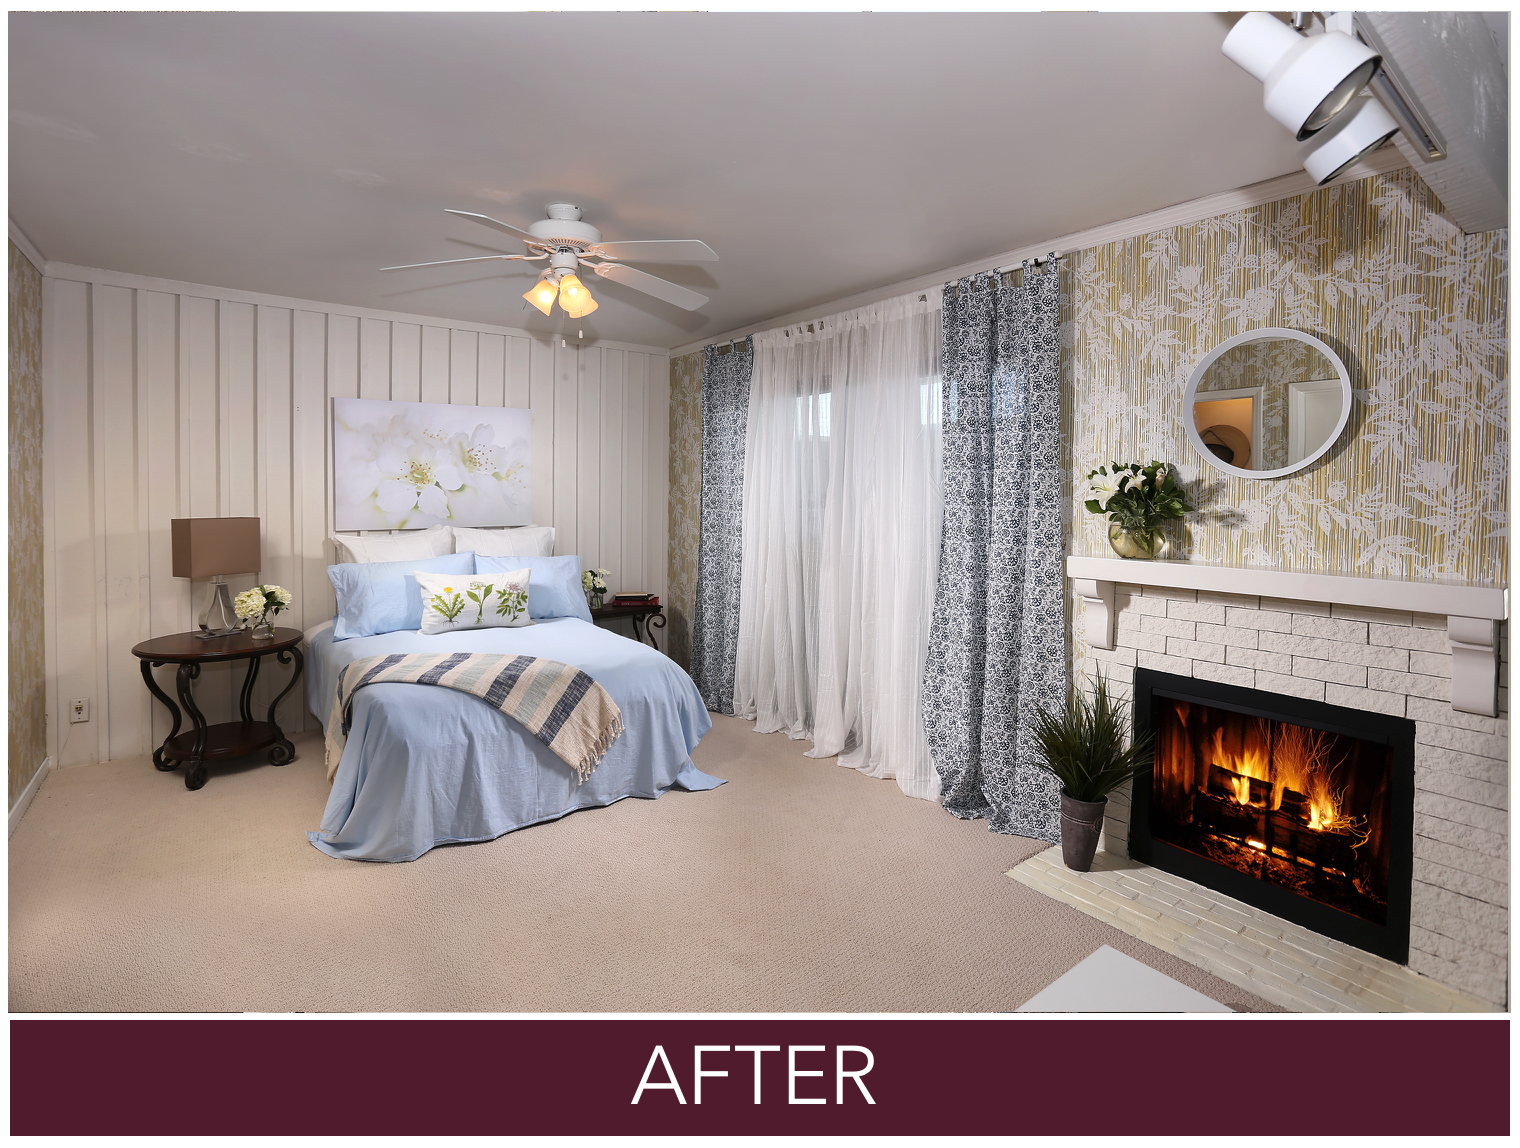 Bedroom_After.png